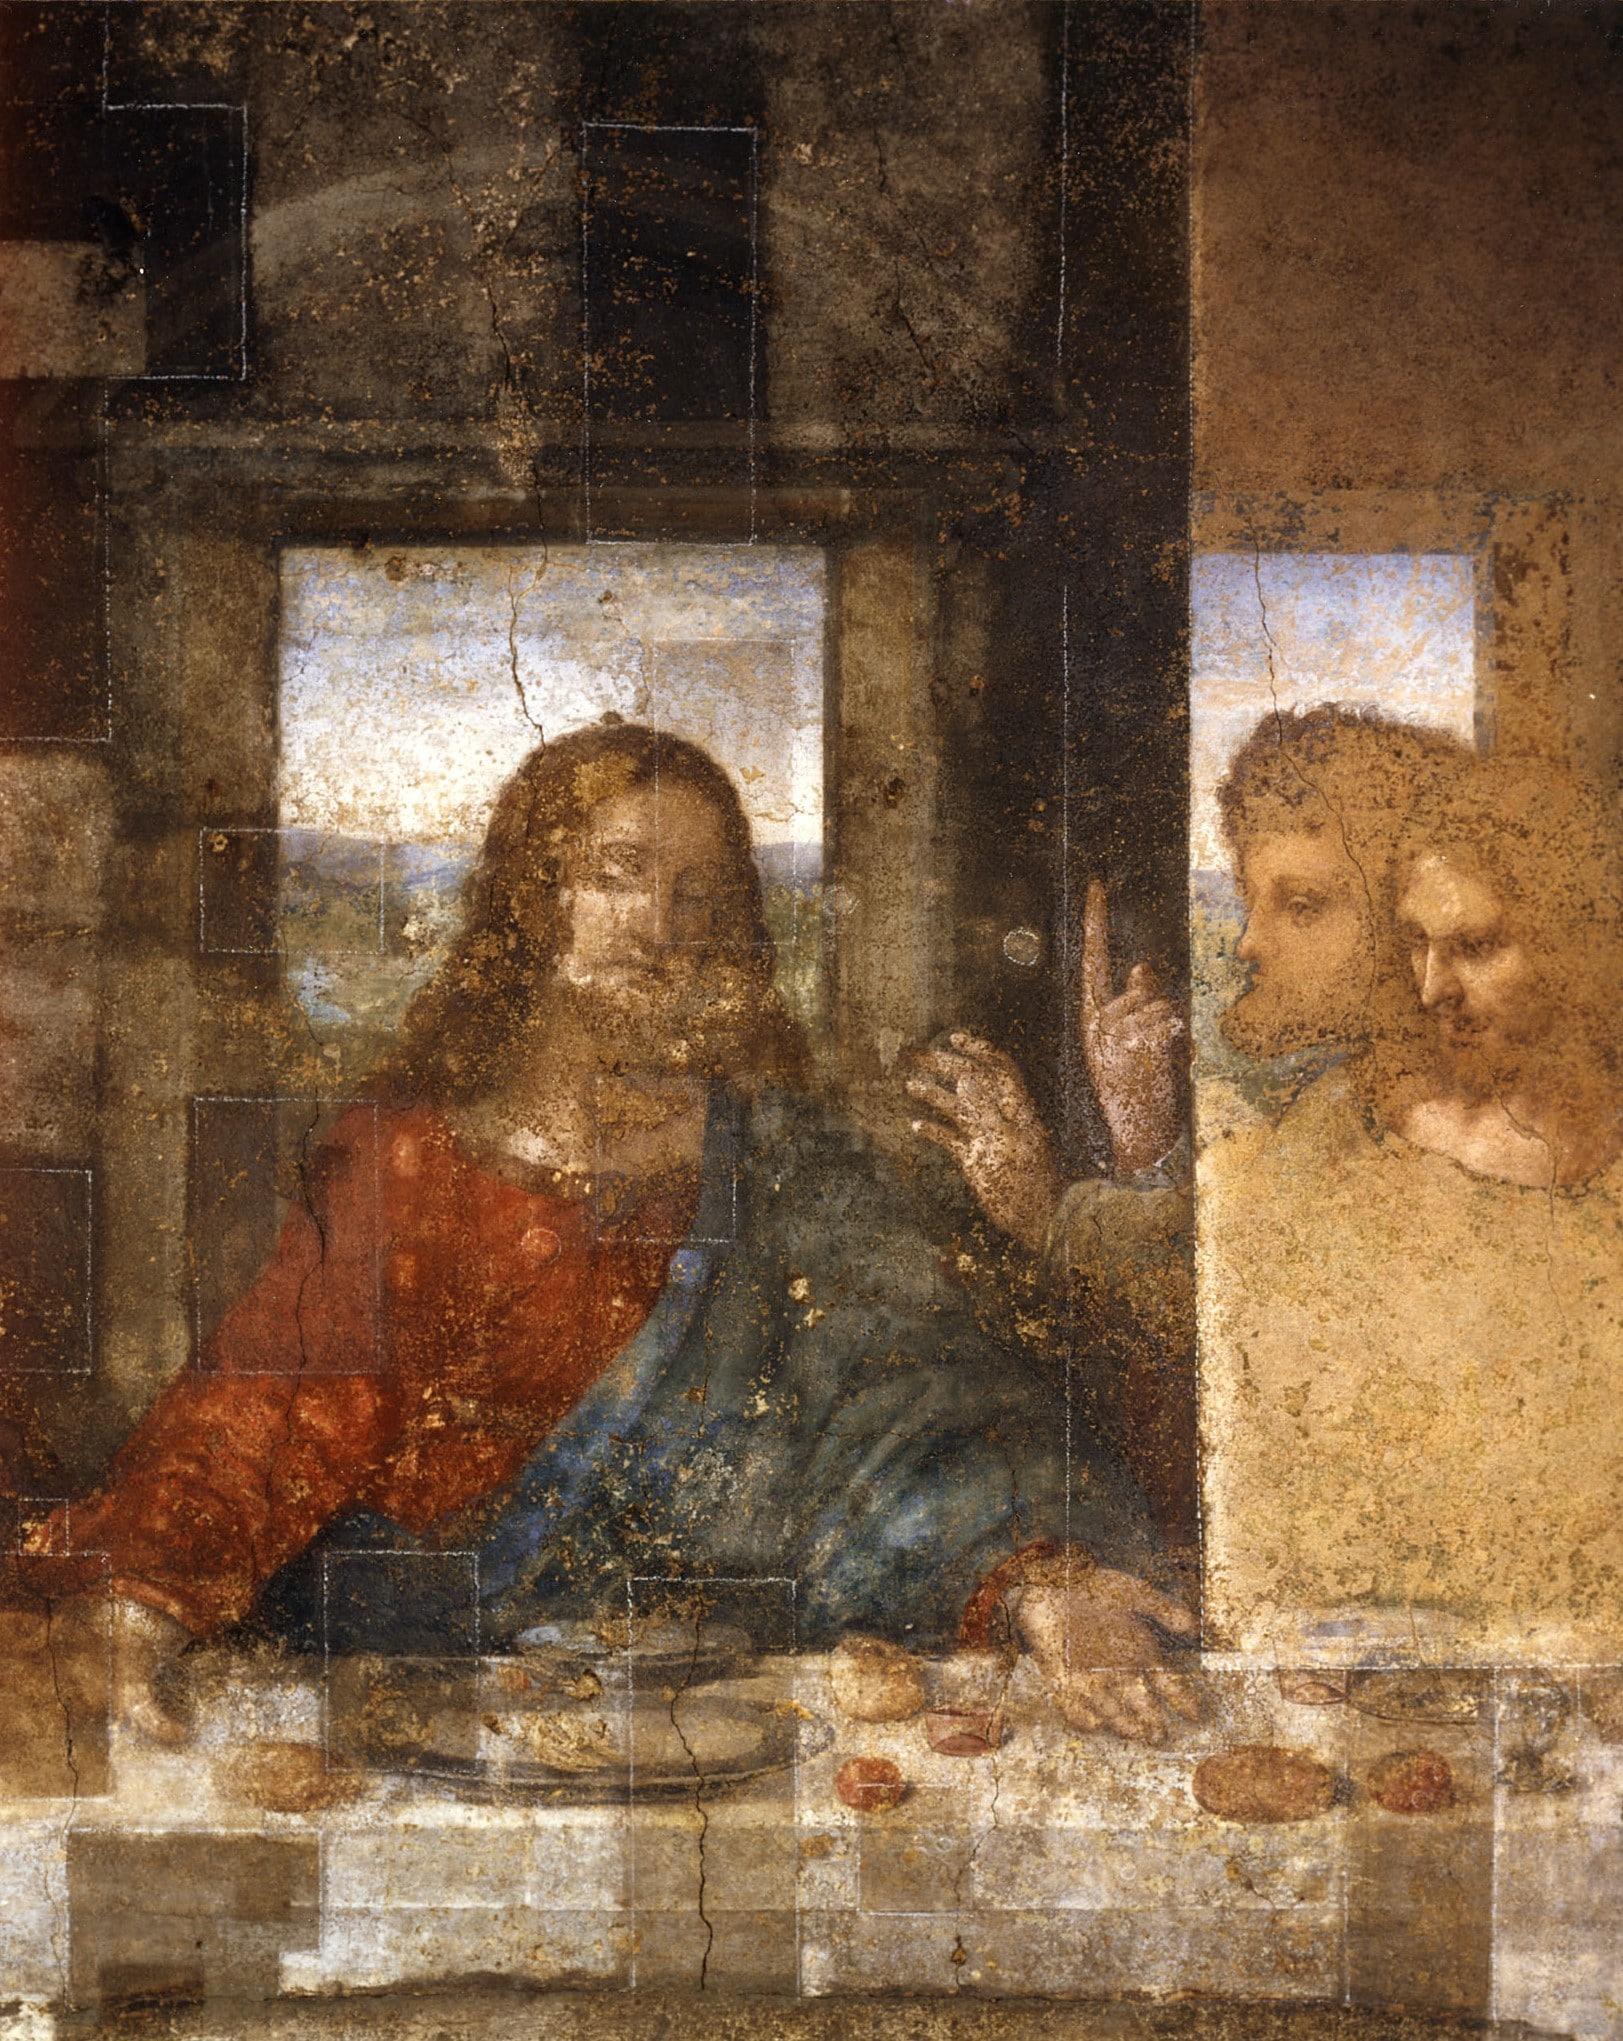 Detail during the restoration work by Pinin Brambilla Barcilon